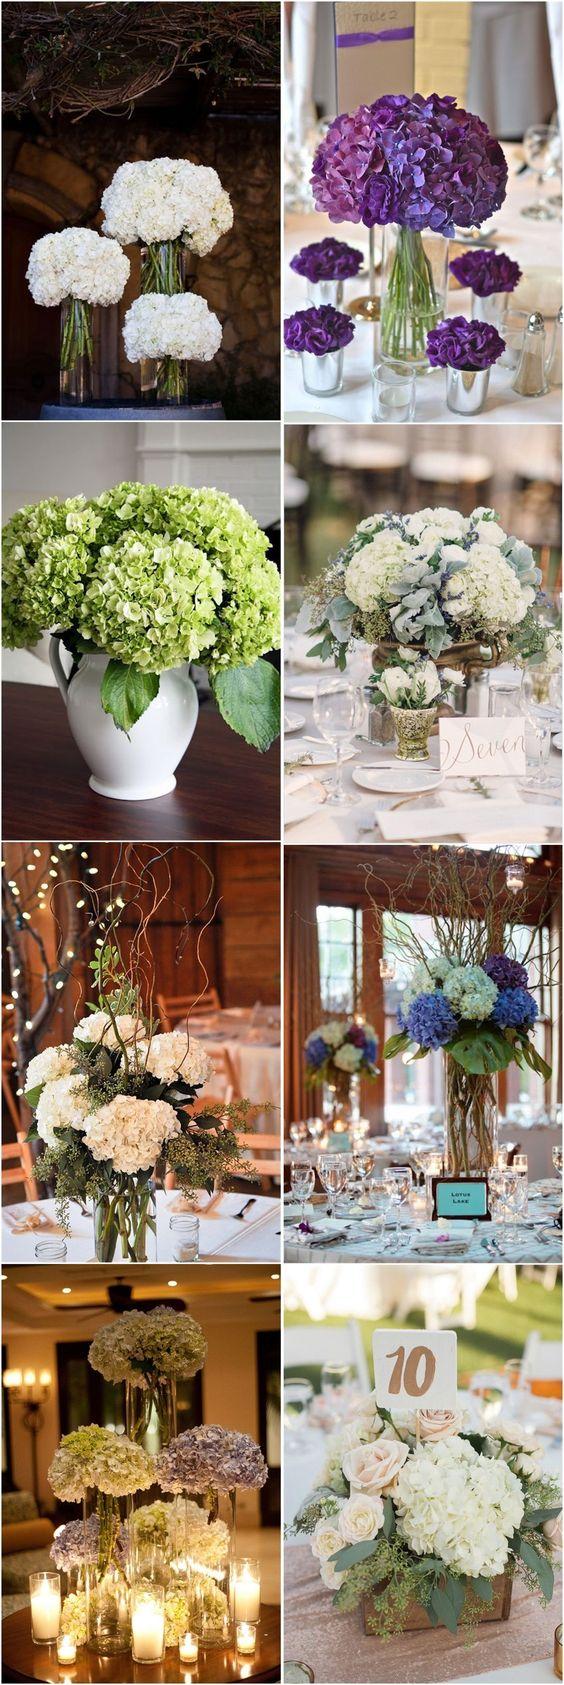 Diy decorations for wedding   Simple Yet Rustic DIY Hydrangea Wedding Centerpieces Ideas